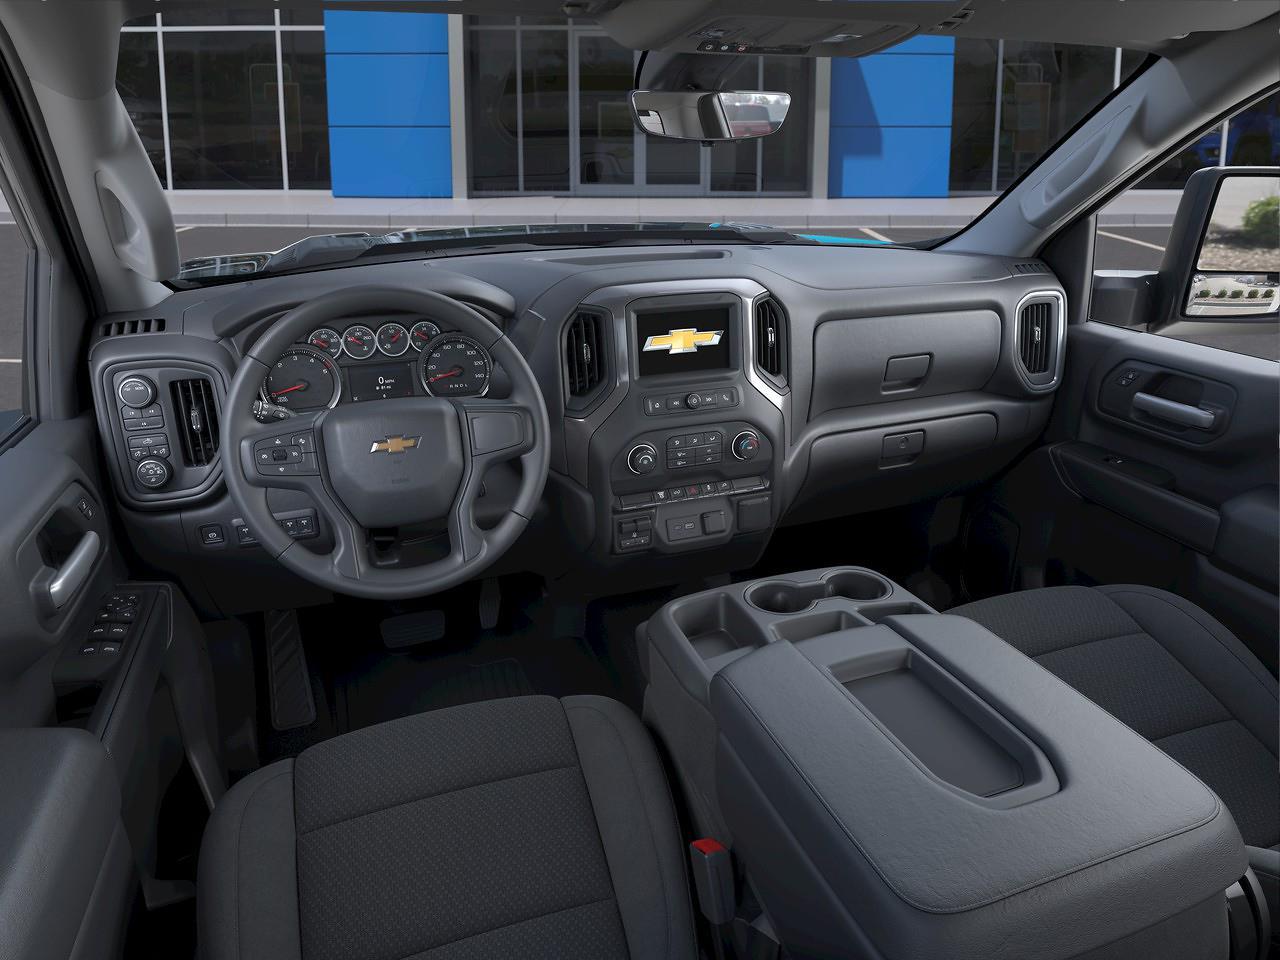 2021 Chevrolet Silverado 2500 Crew Cab 4x4, Pickup #Q210455 - photo 12